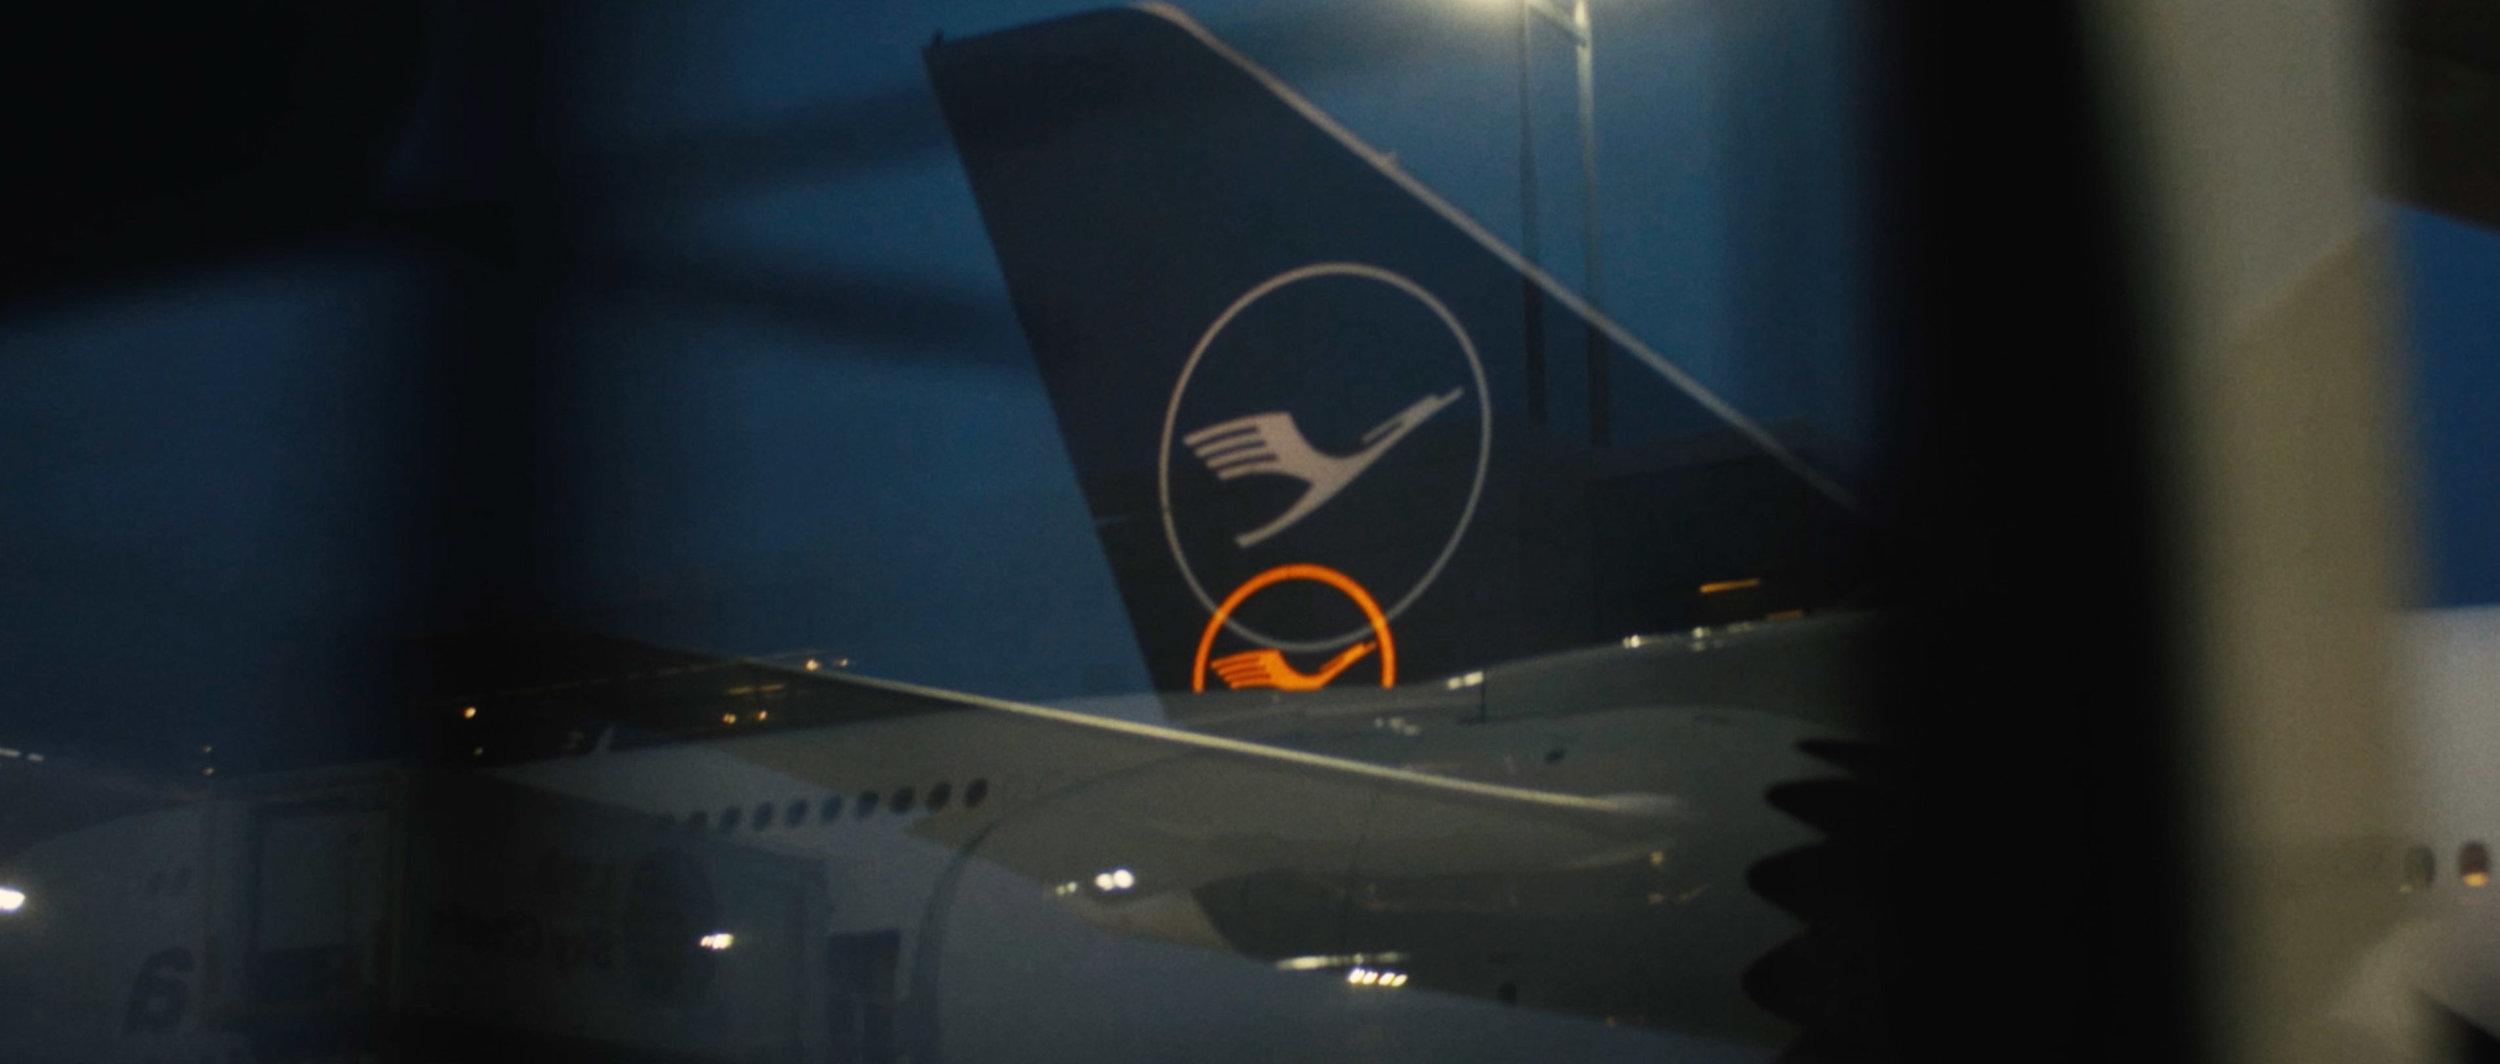 Lufthansa-Airplane-New-Airport-Surface-Beklebung-Travel-TakeOff_08.jpg